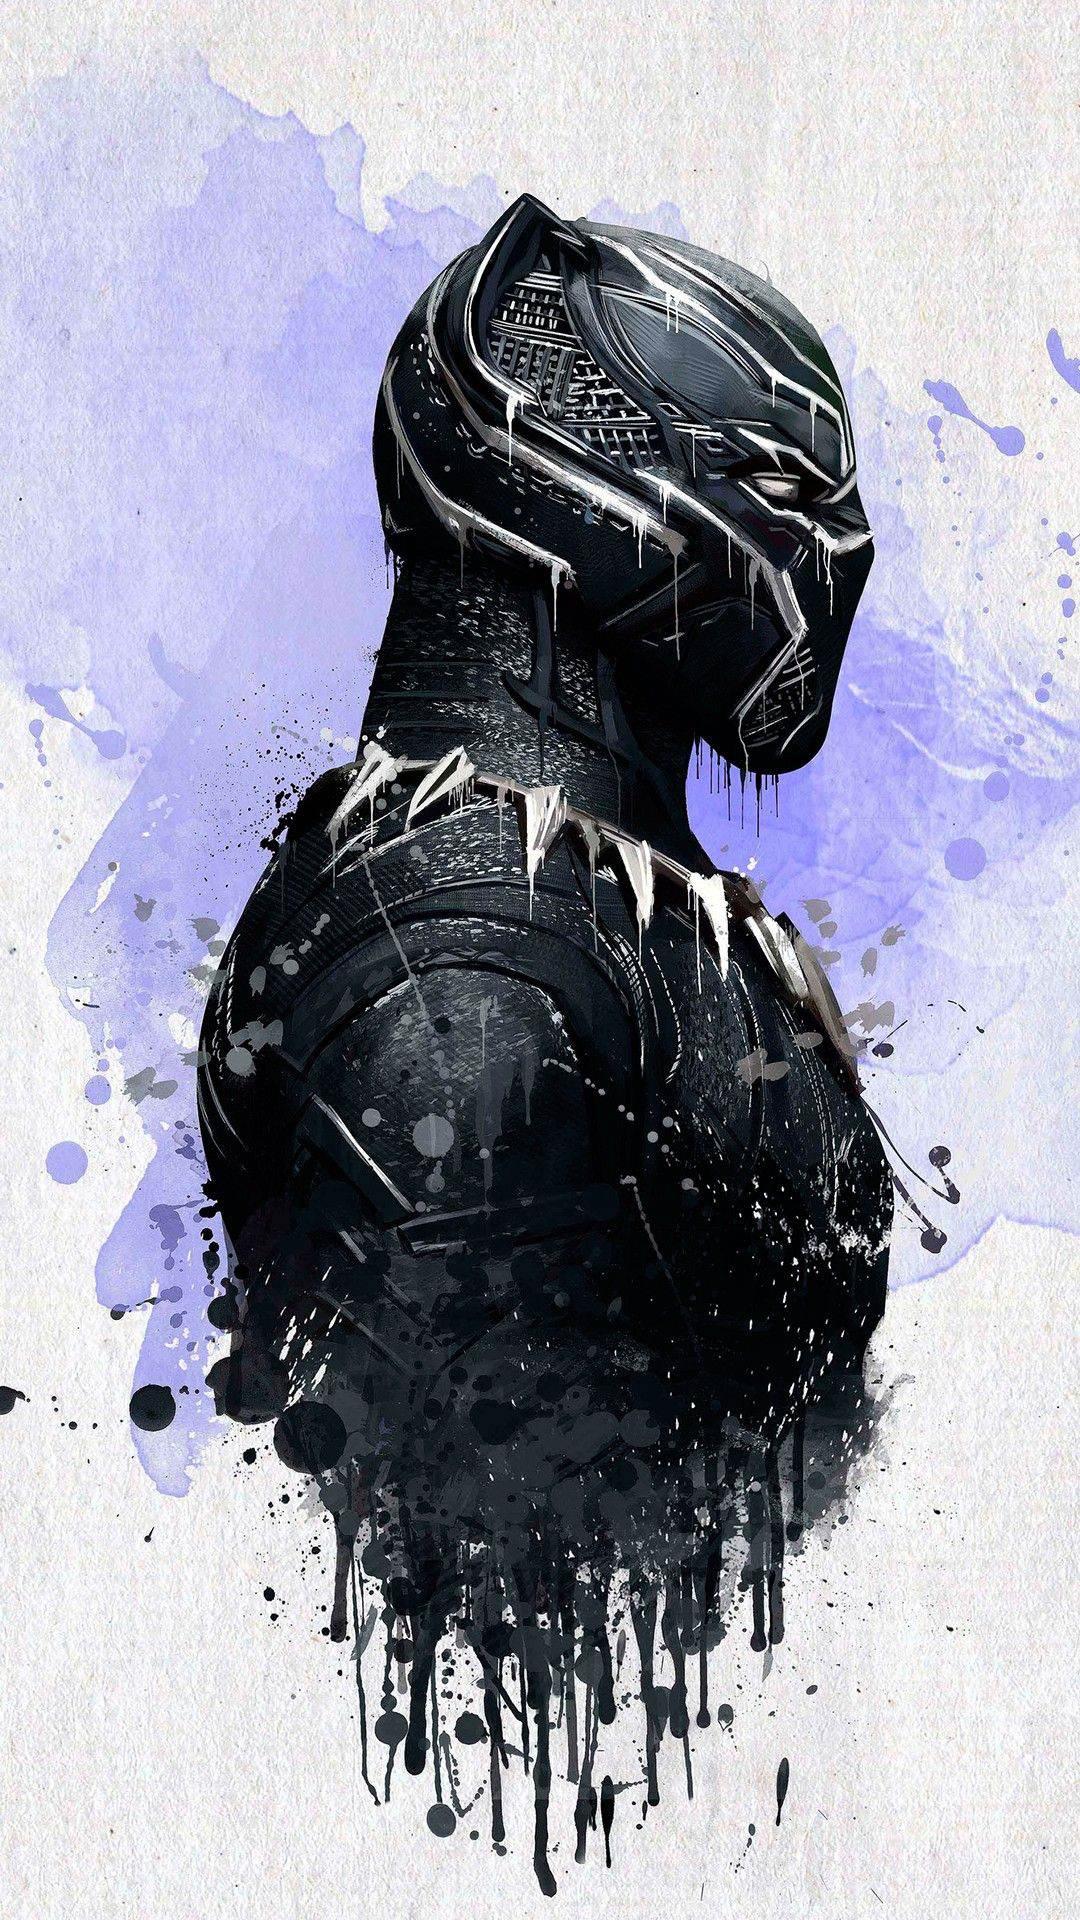 Black Panther Painting Artwork iPhone Wallpaper